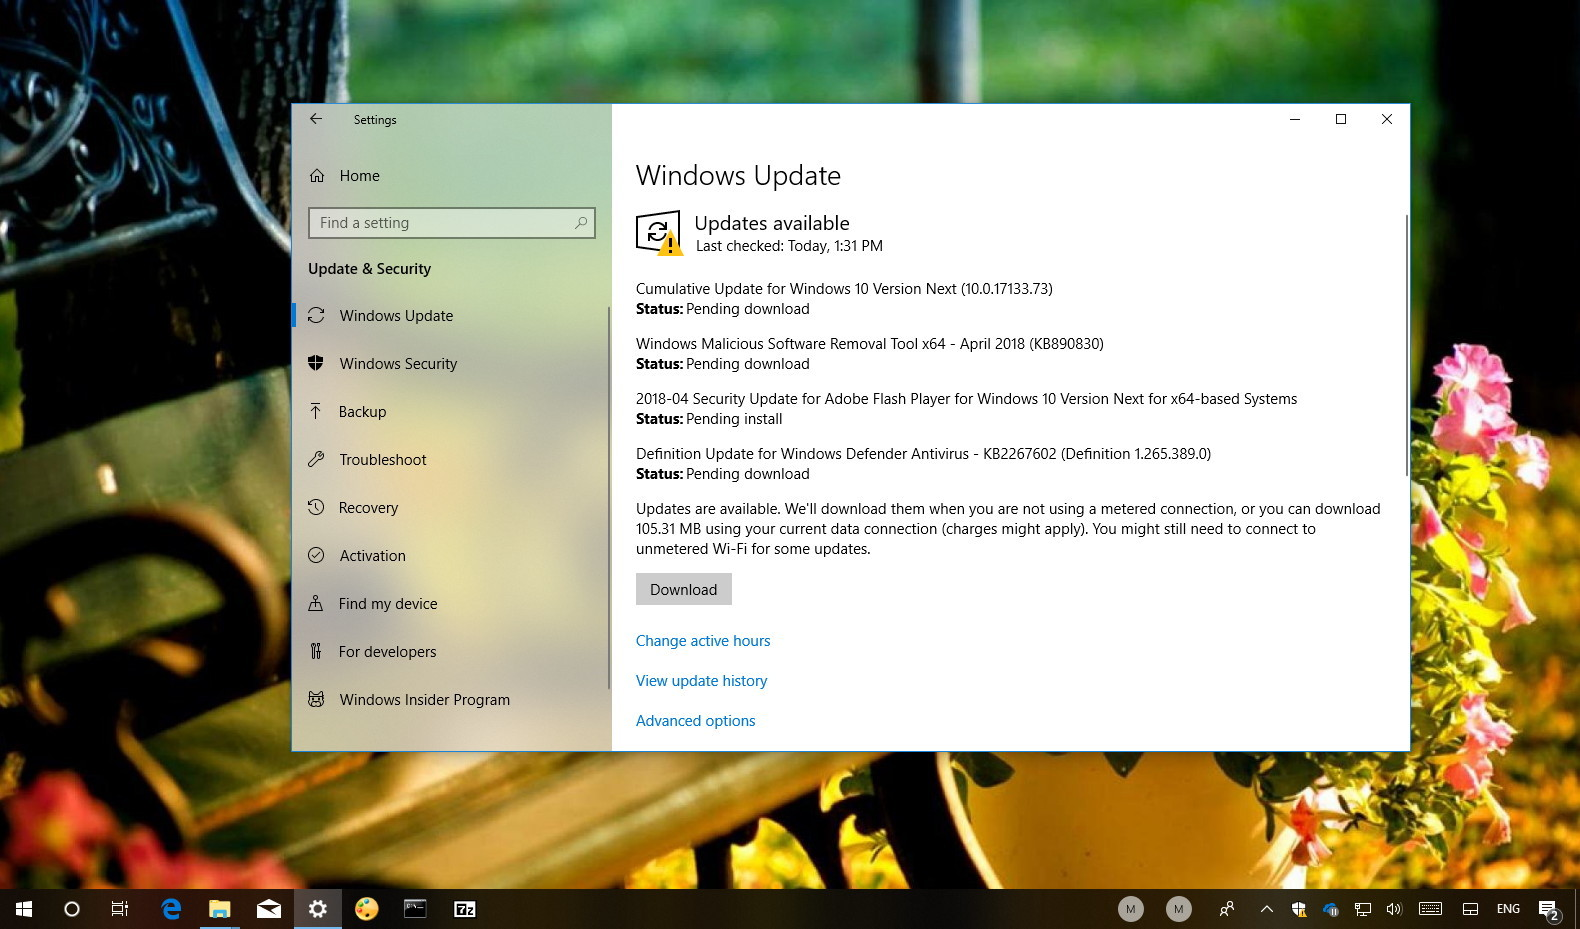 Windows 10 update KB4100375